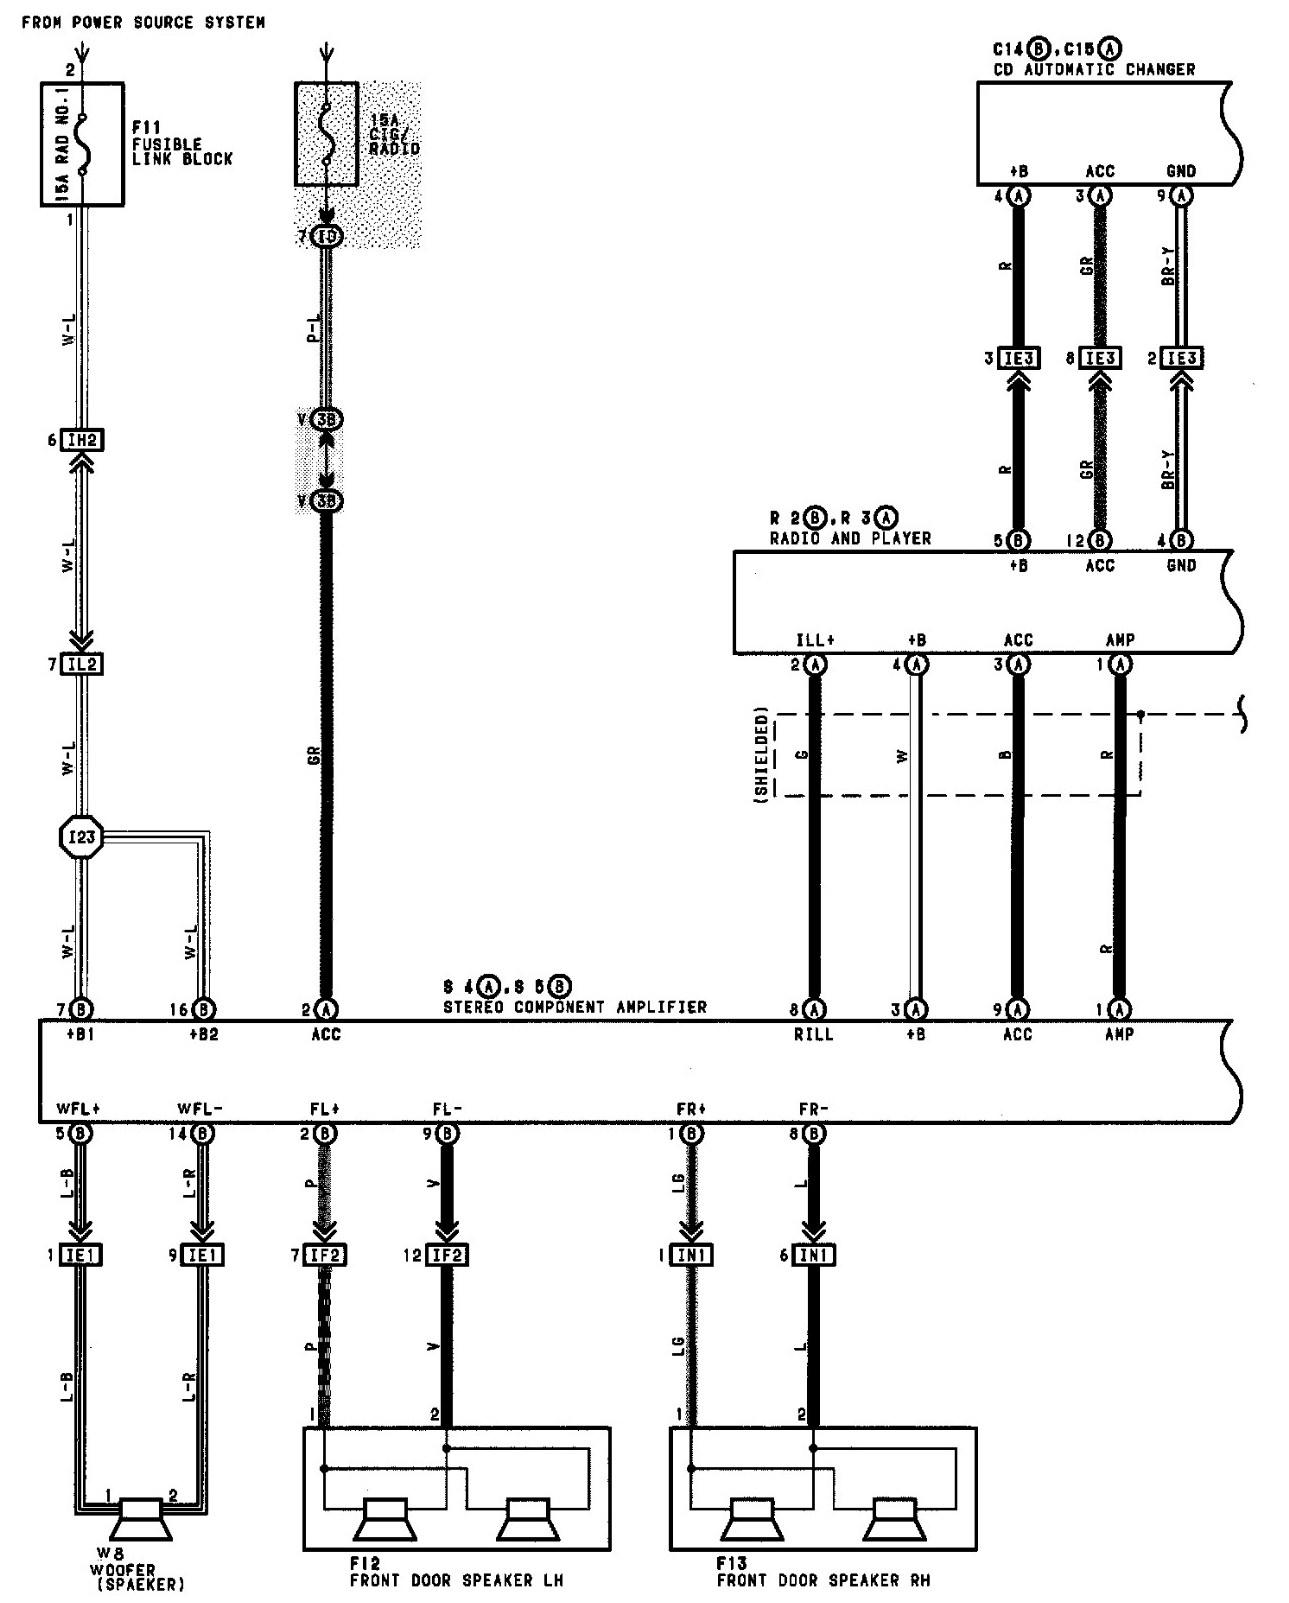 2009 toyota camry wiring diagram